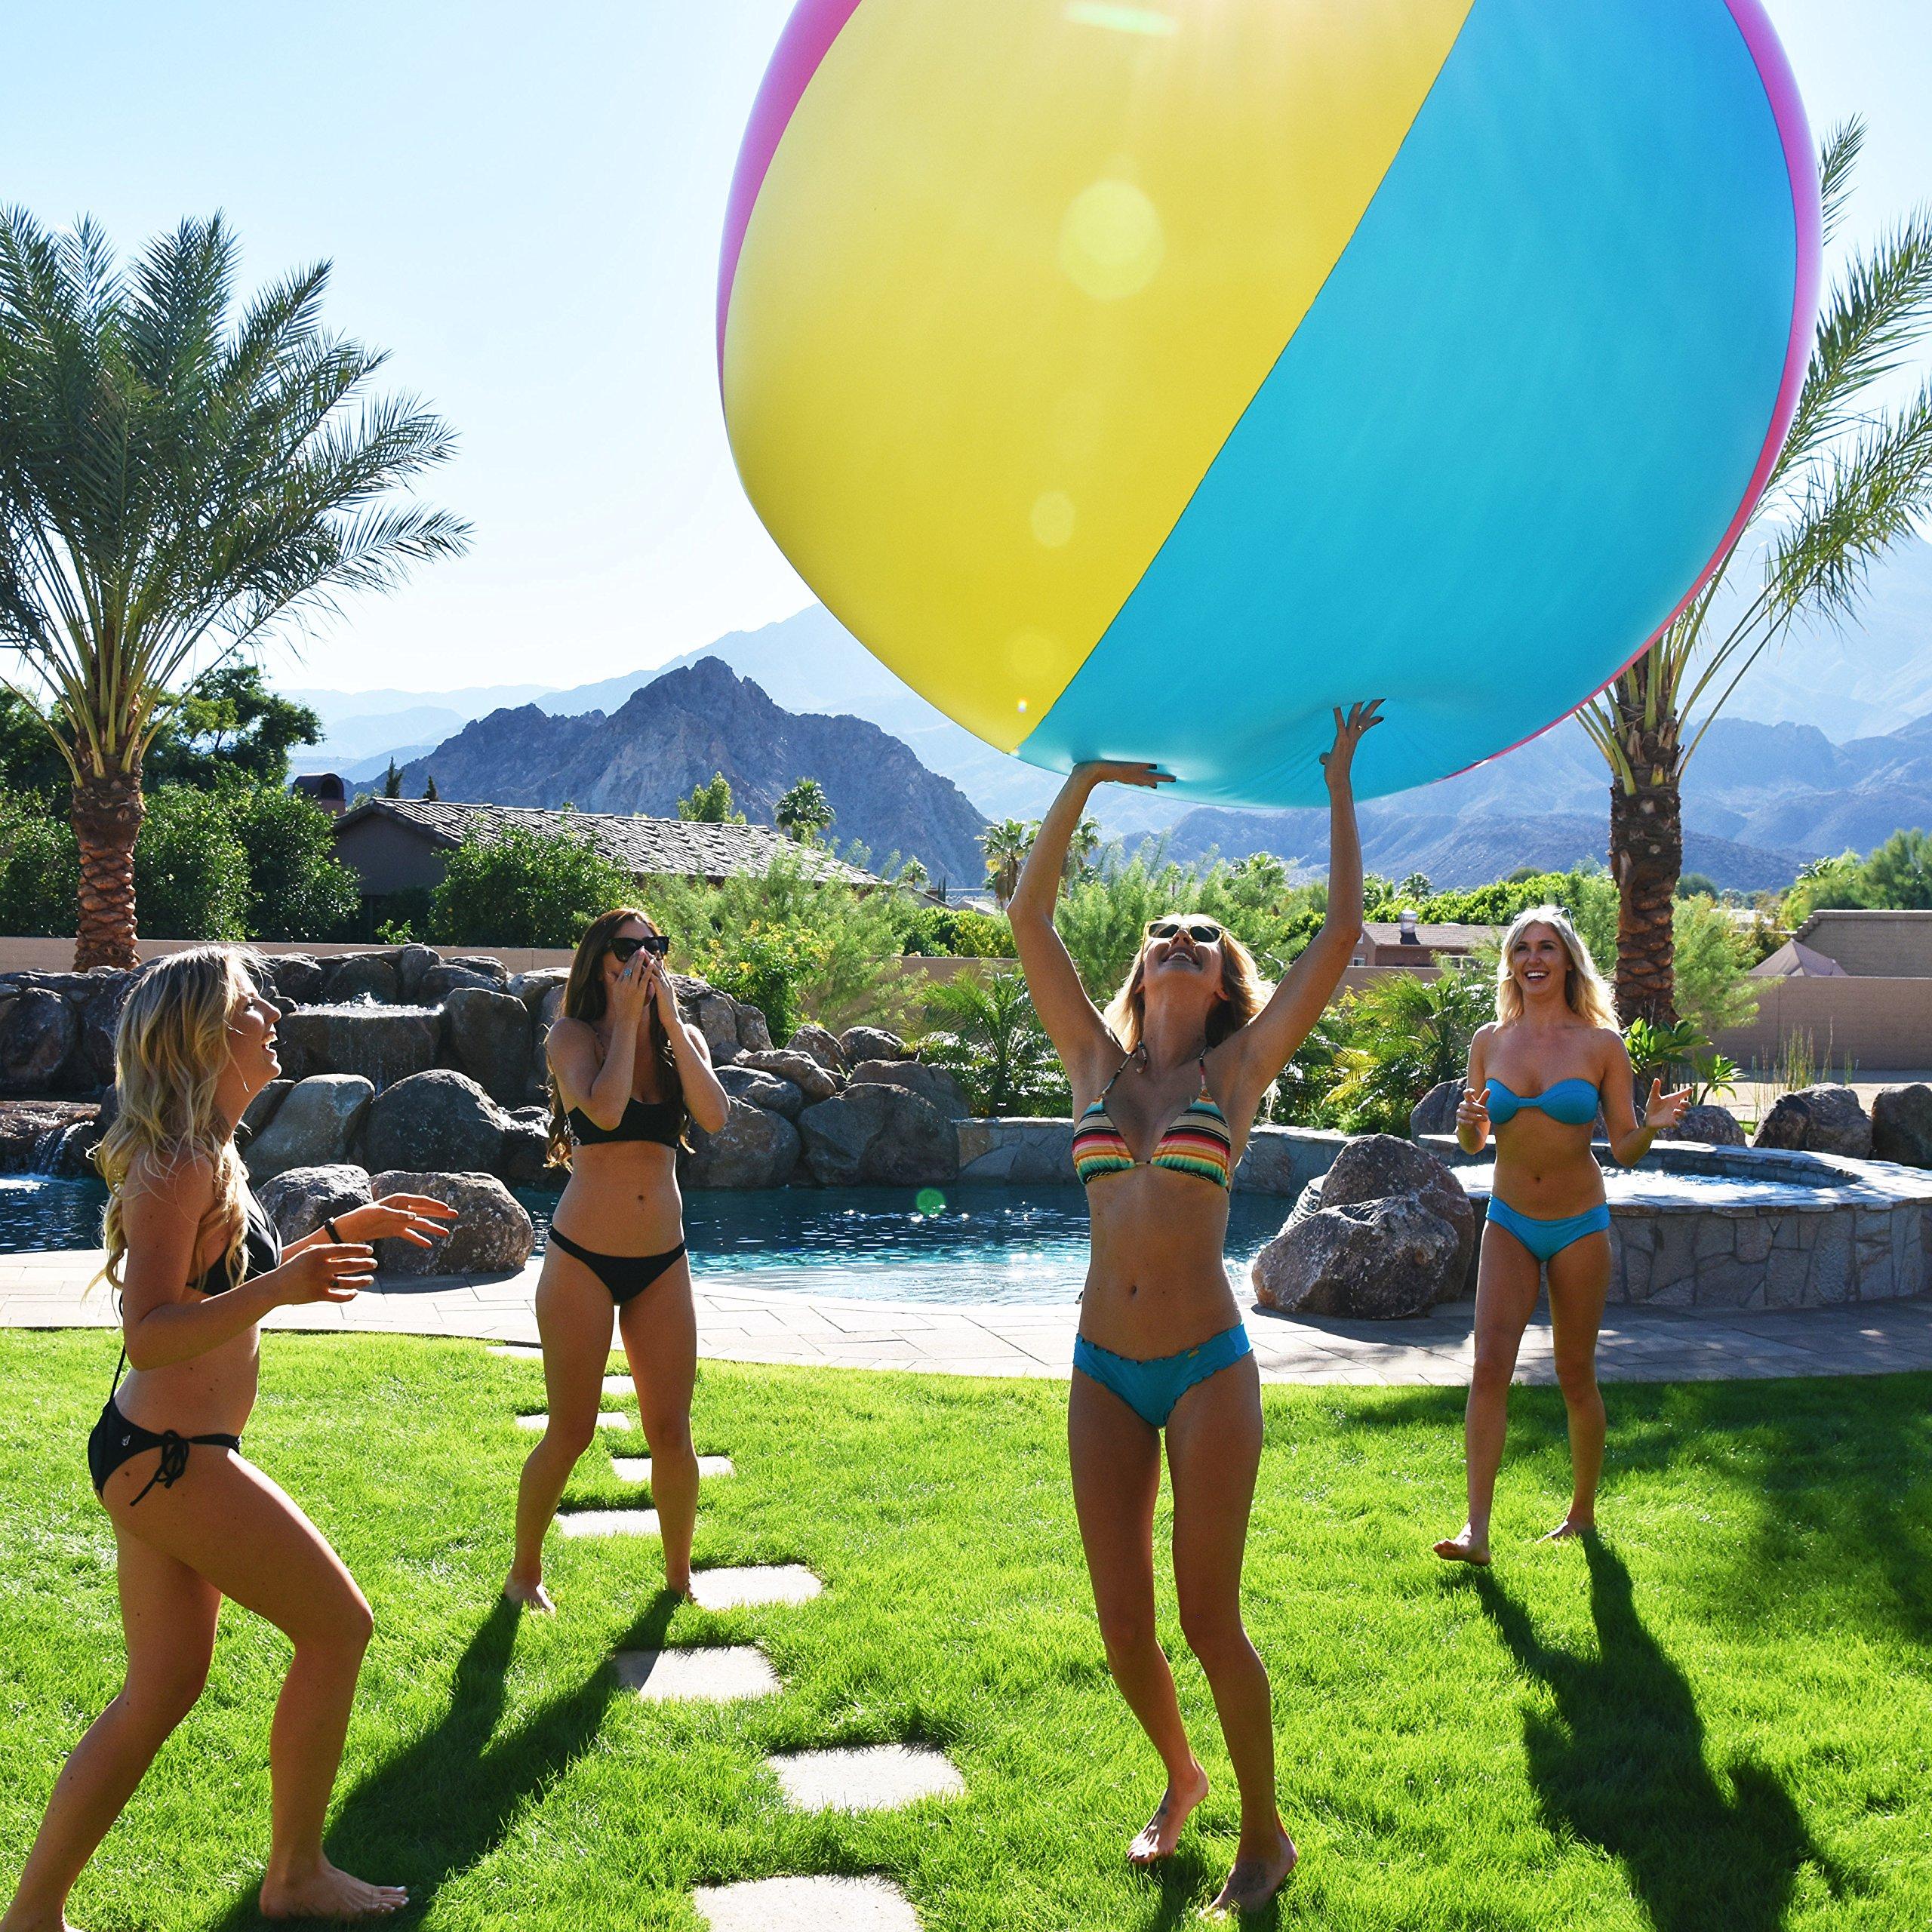 Giant Backyard Games: 6' Giant Inflatable Beach Ball For Summer Beach Backyard